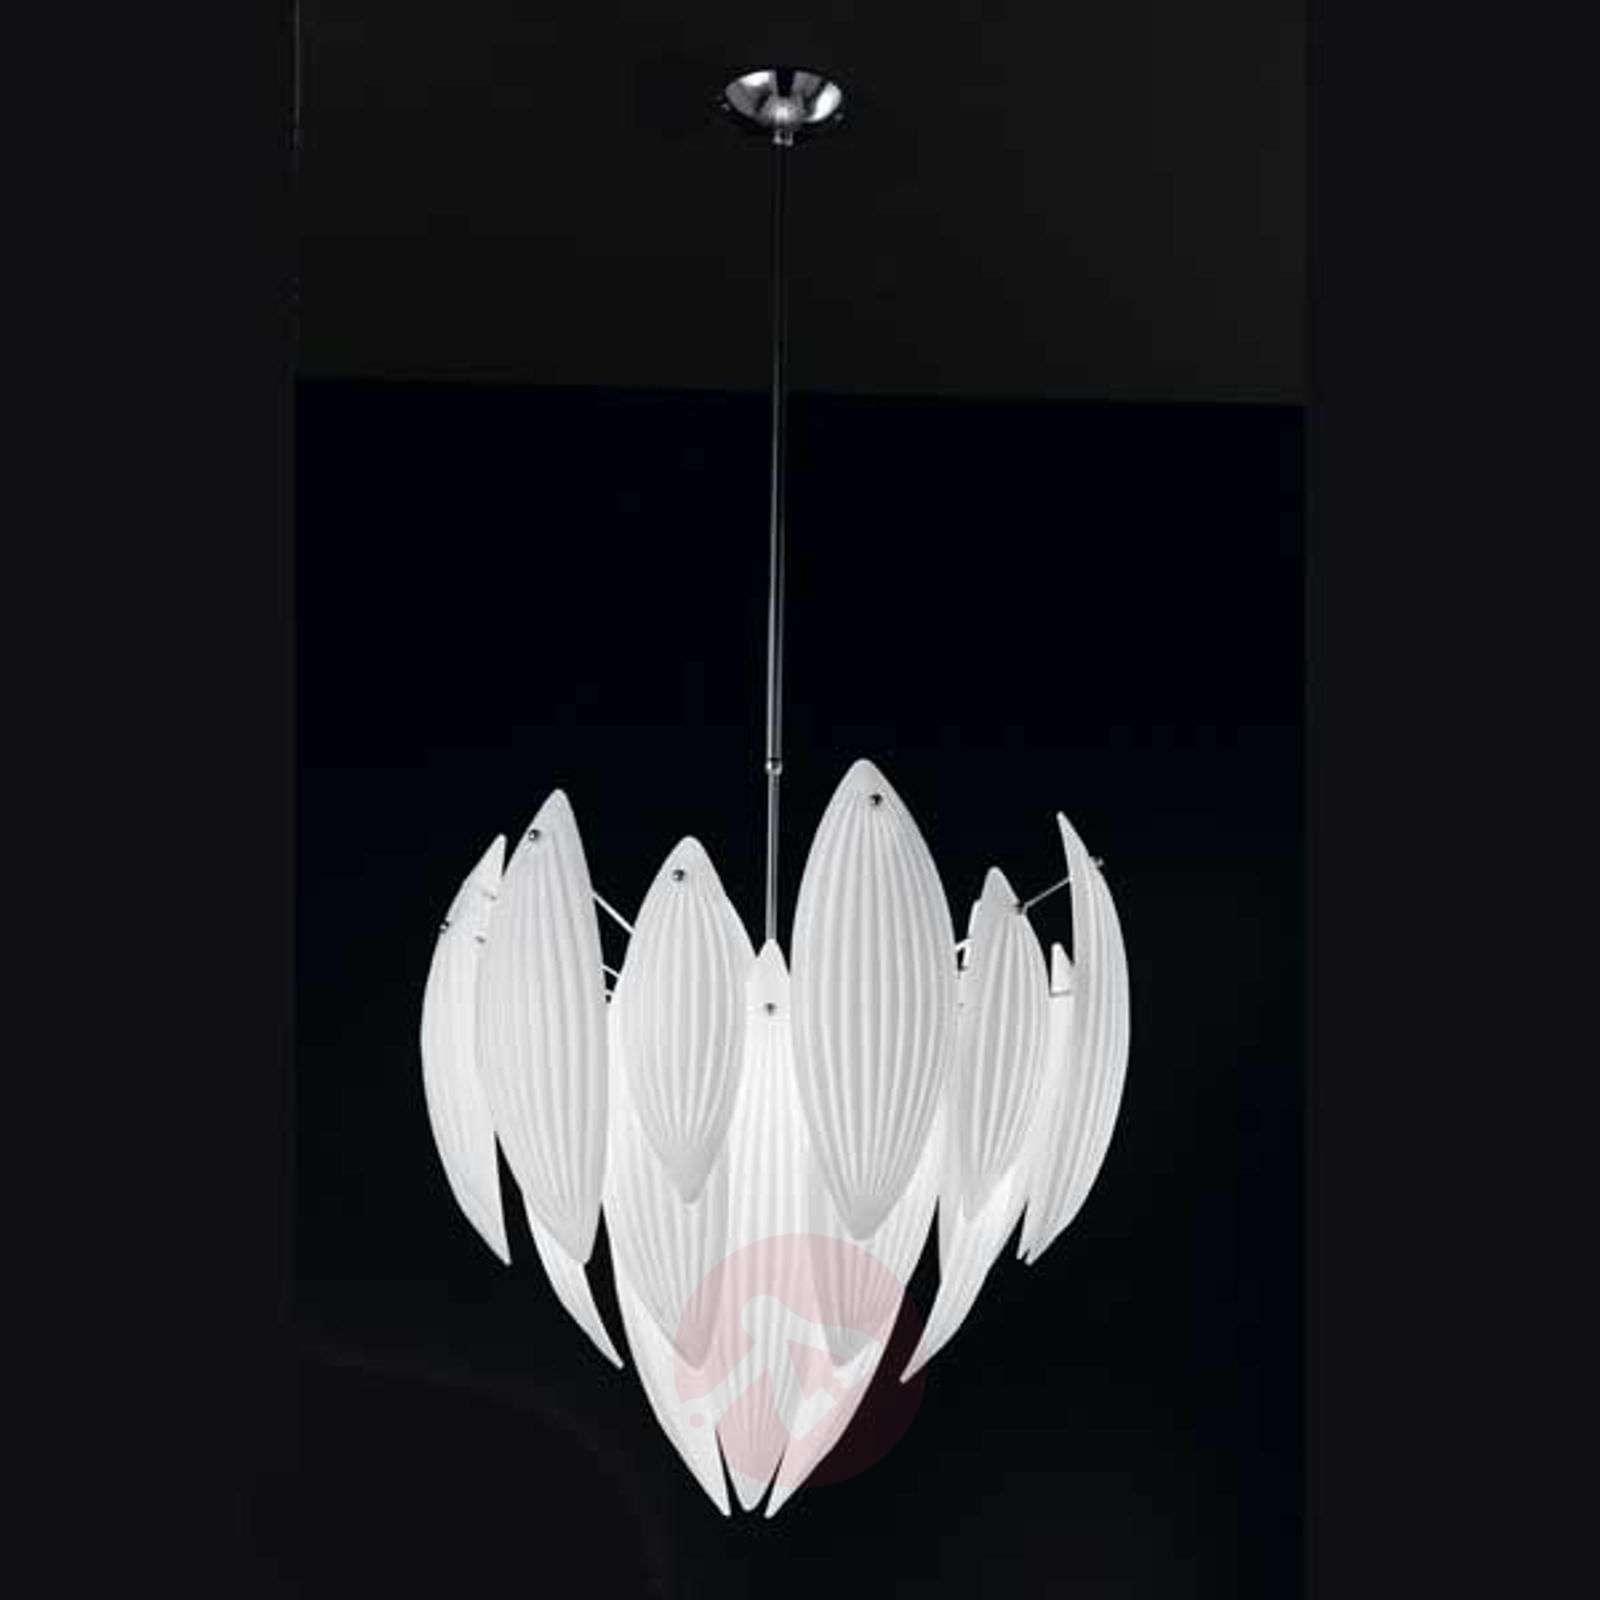 Moderni Paradise-riippuvalaisin 62 cm, kromi-5015057-01